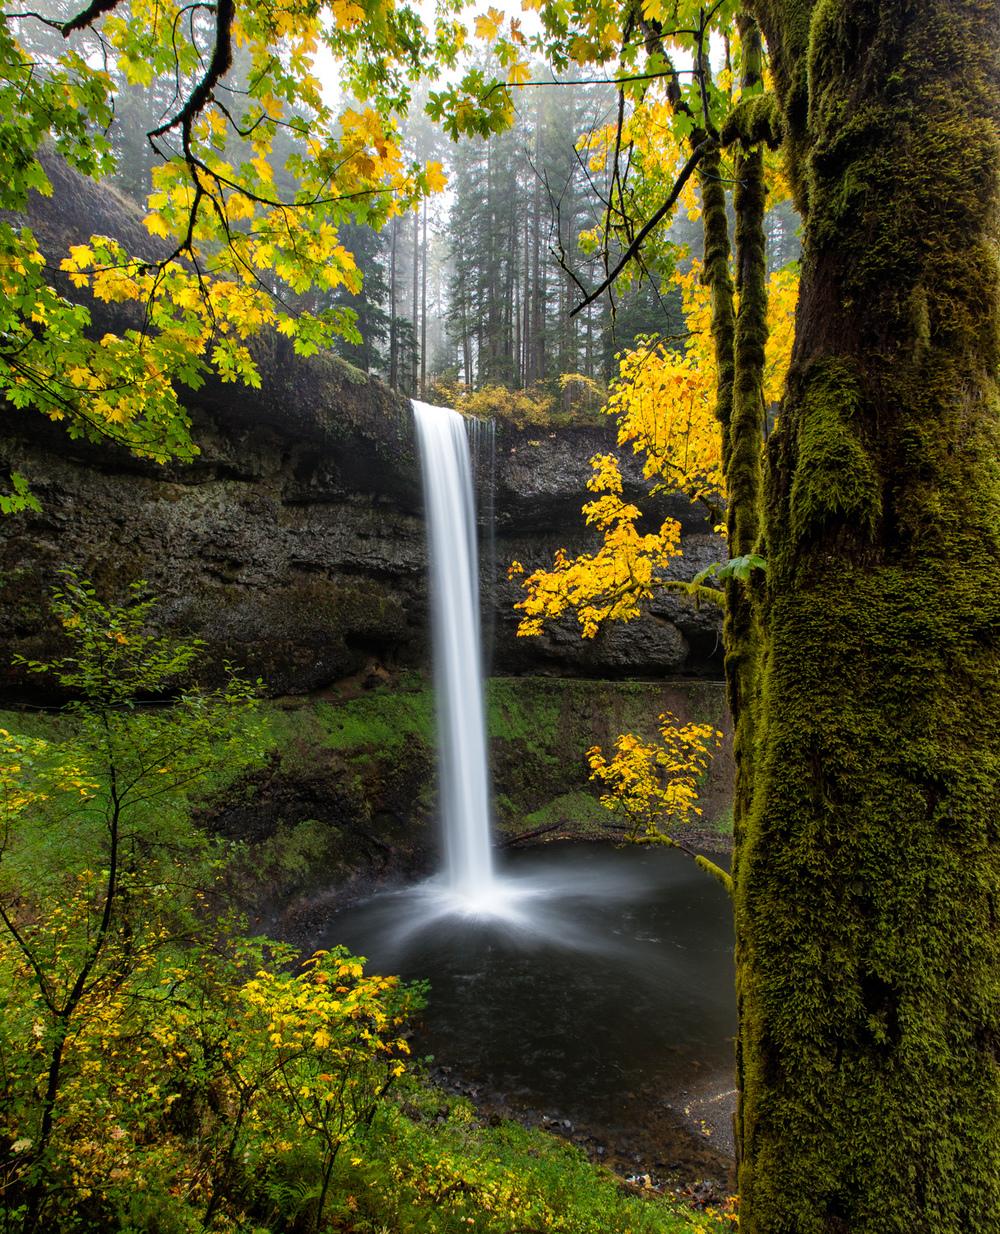 Autumn Gold at Silver Falls